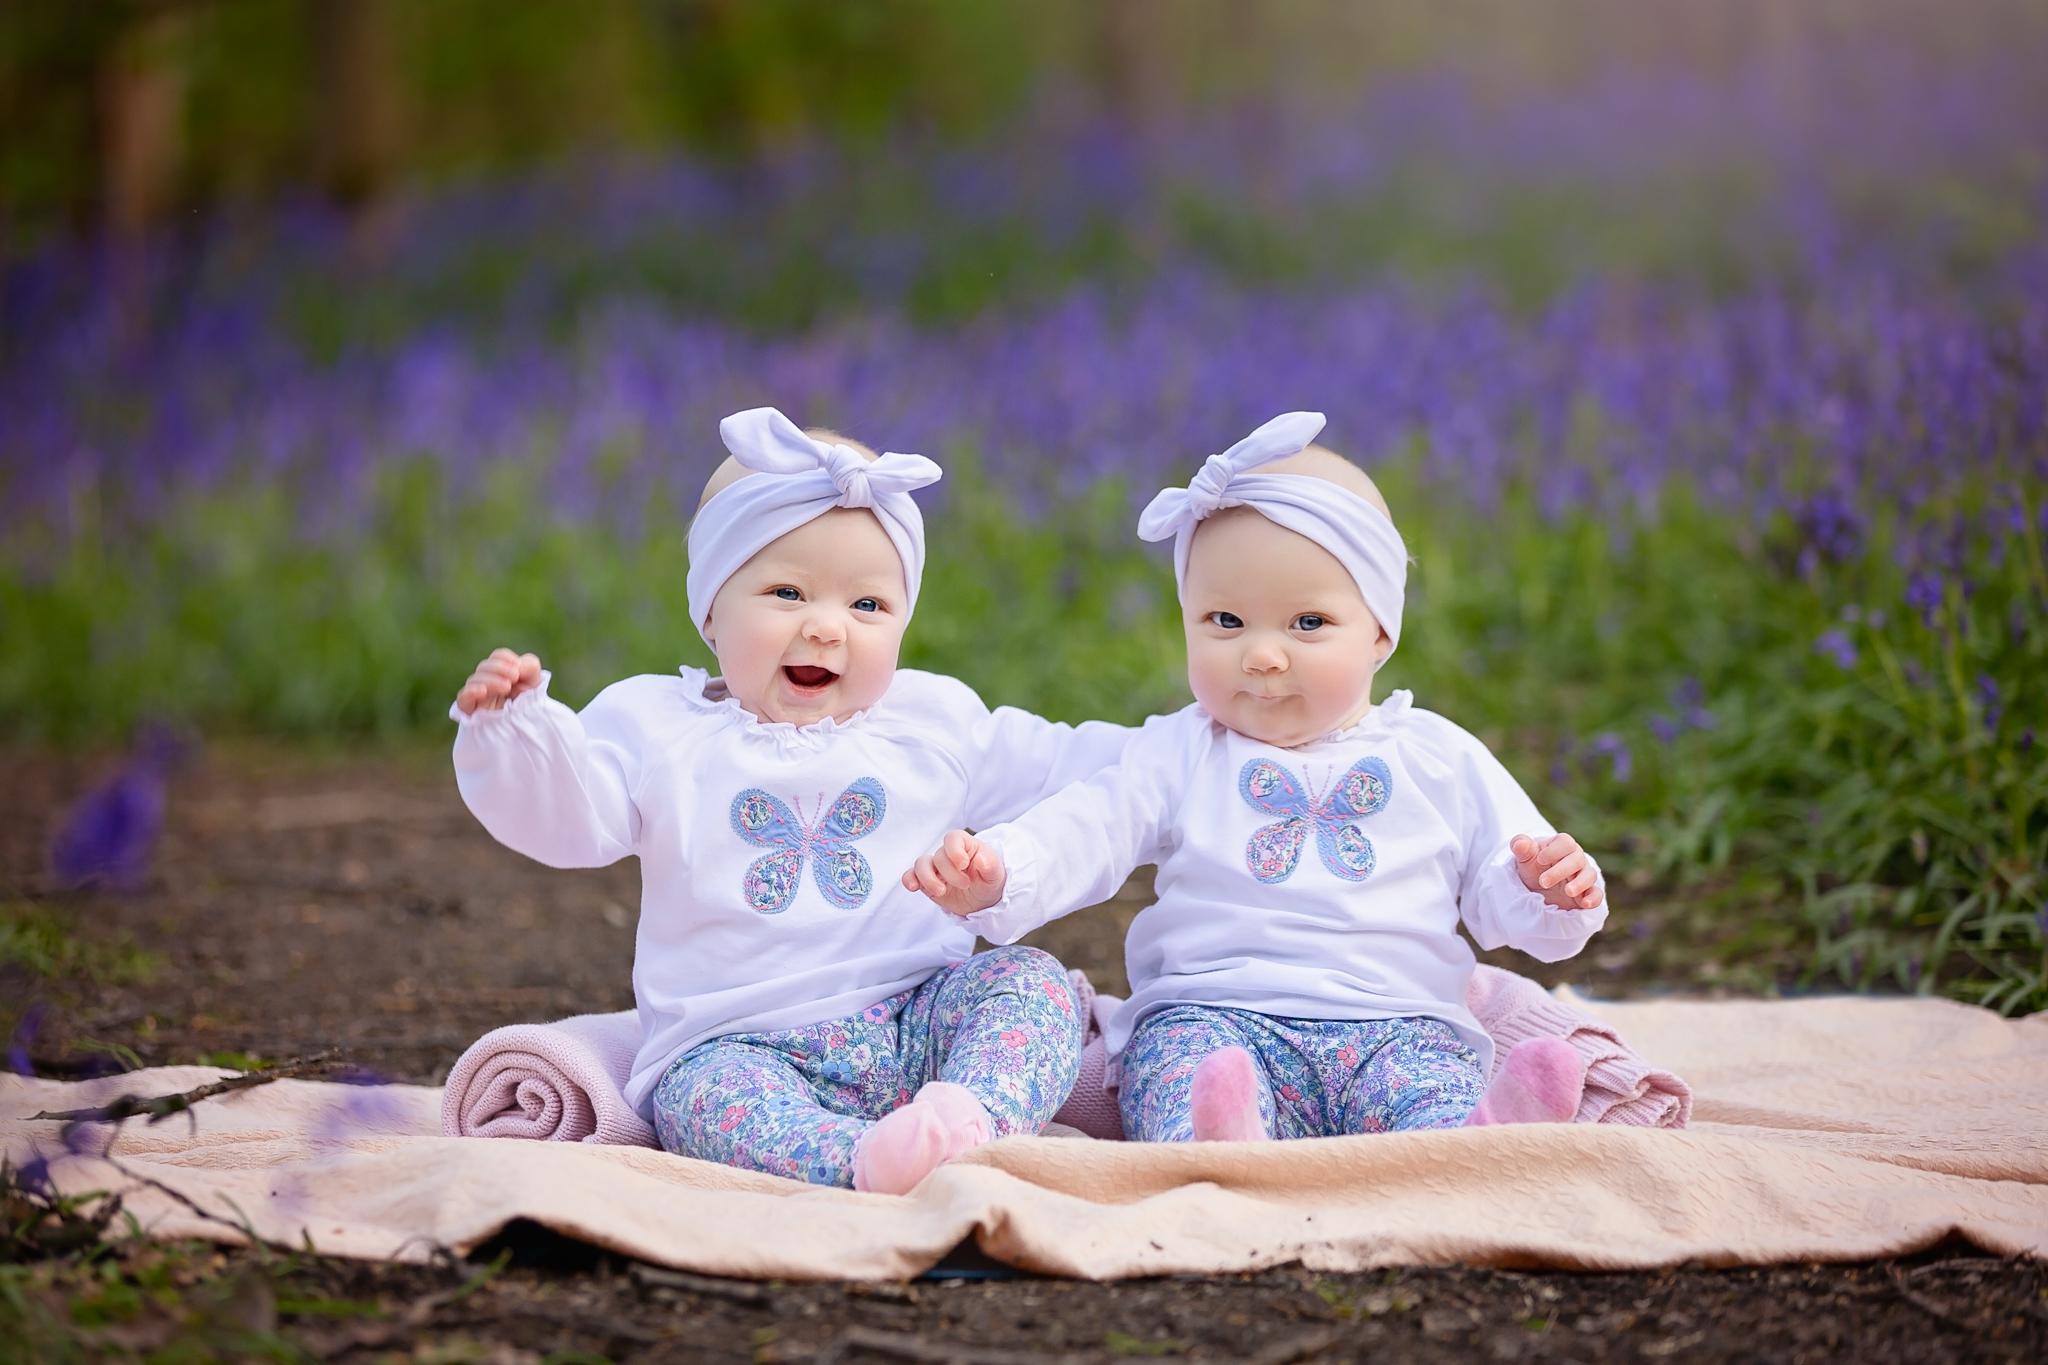 Children photographer Leeds, York, Harrogare, Bradford: twin baby girls during their sitter session in Leeds, West Yorkshire